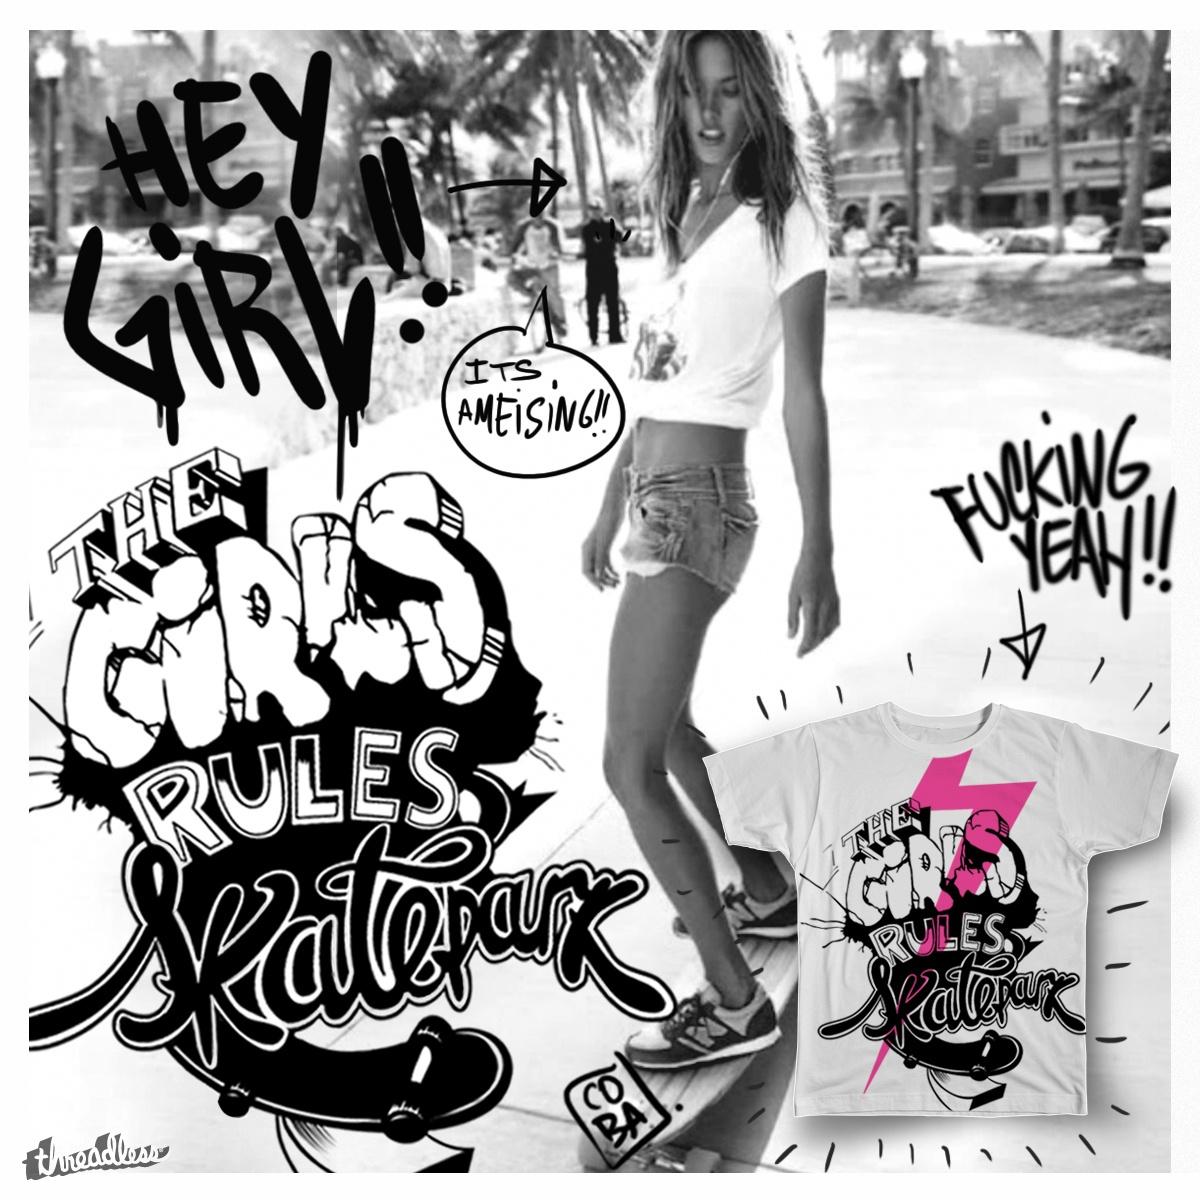 The Girls Rules in da Skatepark by wearecoba on Threadless